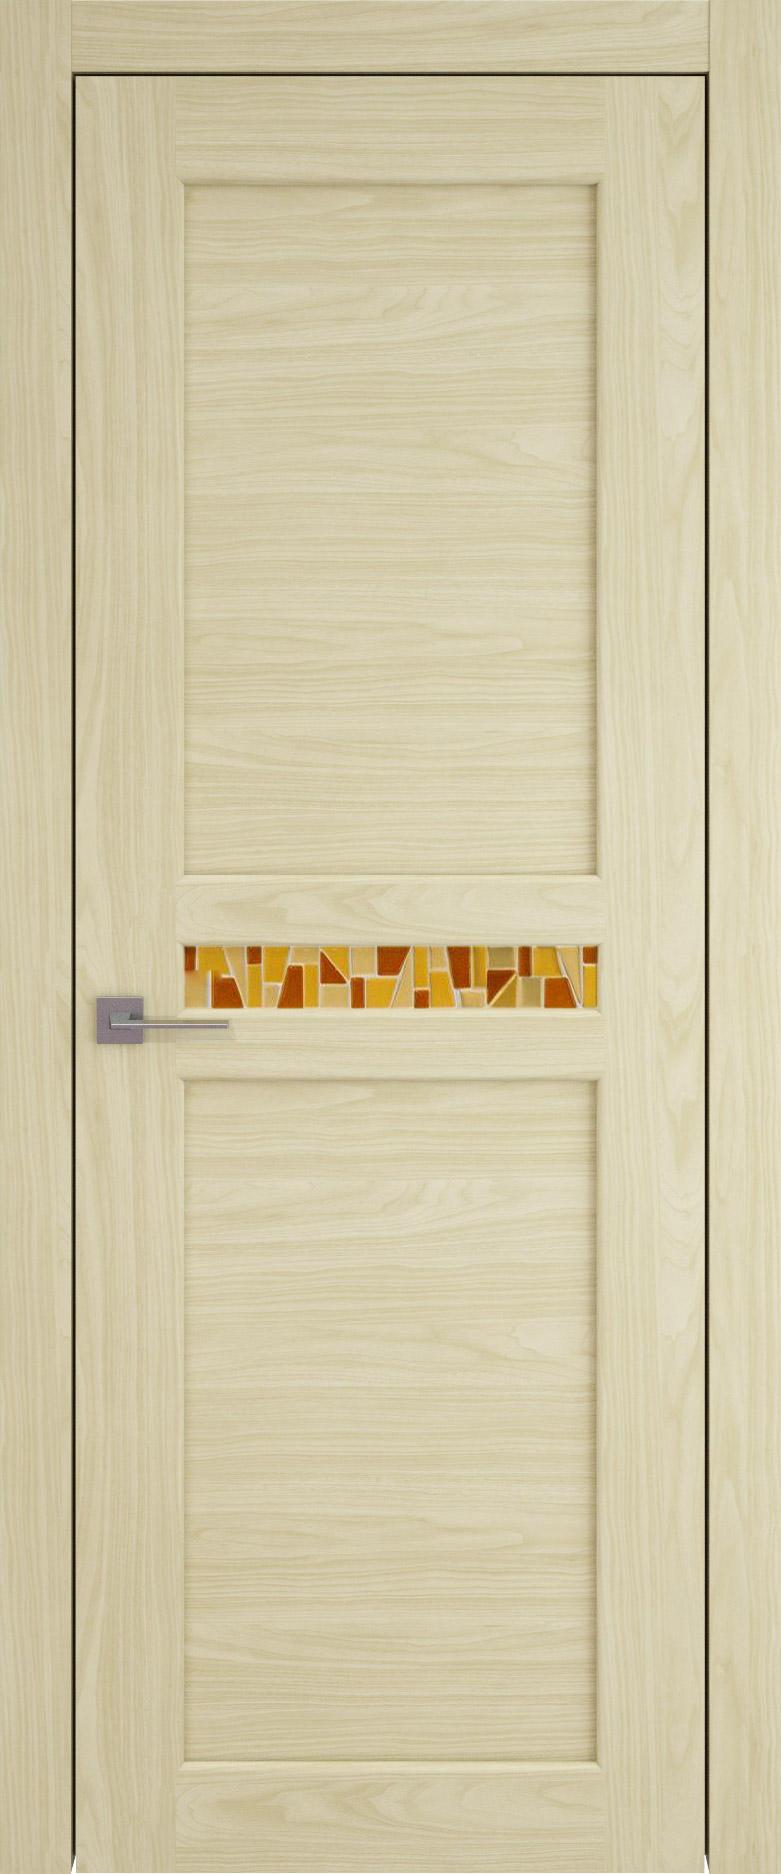 Verona цвет - Дуб нордик Без стекла (ДГ)